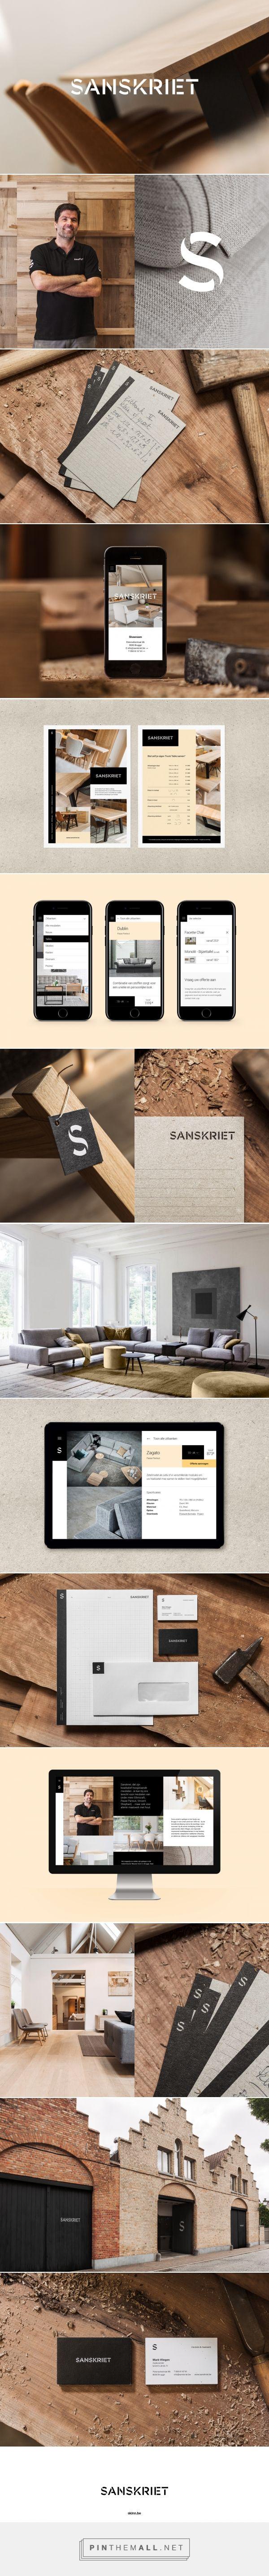 Sanskriet Quality Furniture Branding by Skinn Branding Agency | Fivestar Branding Agency – Design and Branding Agency & Curated Inspiration Gallery http://jrstudioweb.com/diseno-grafico/diseno-de-logotipos/